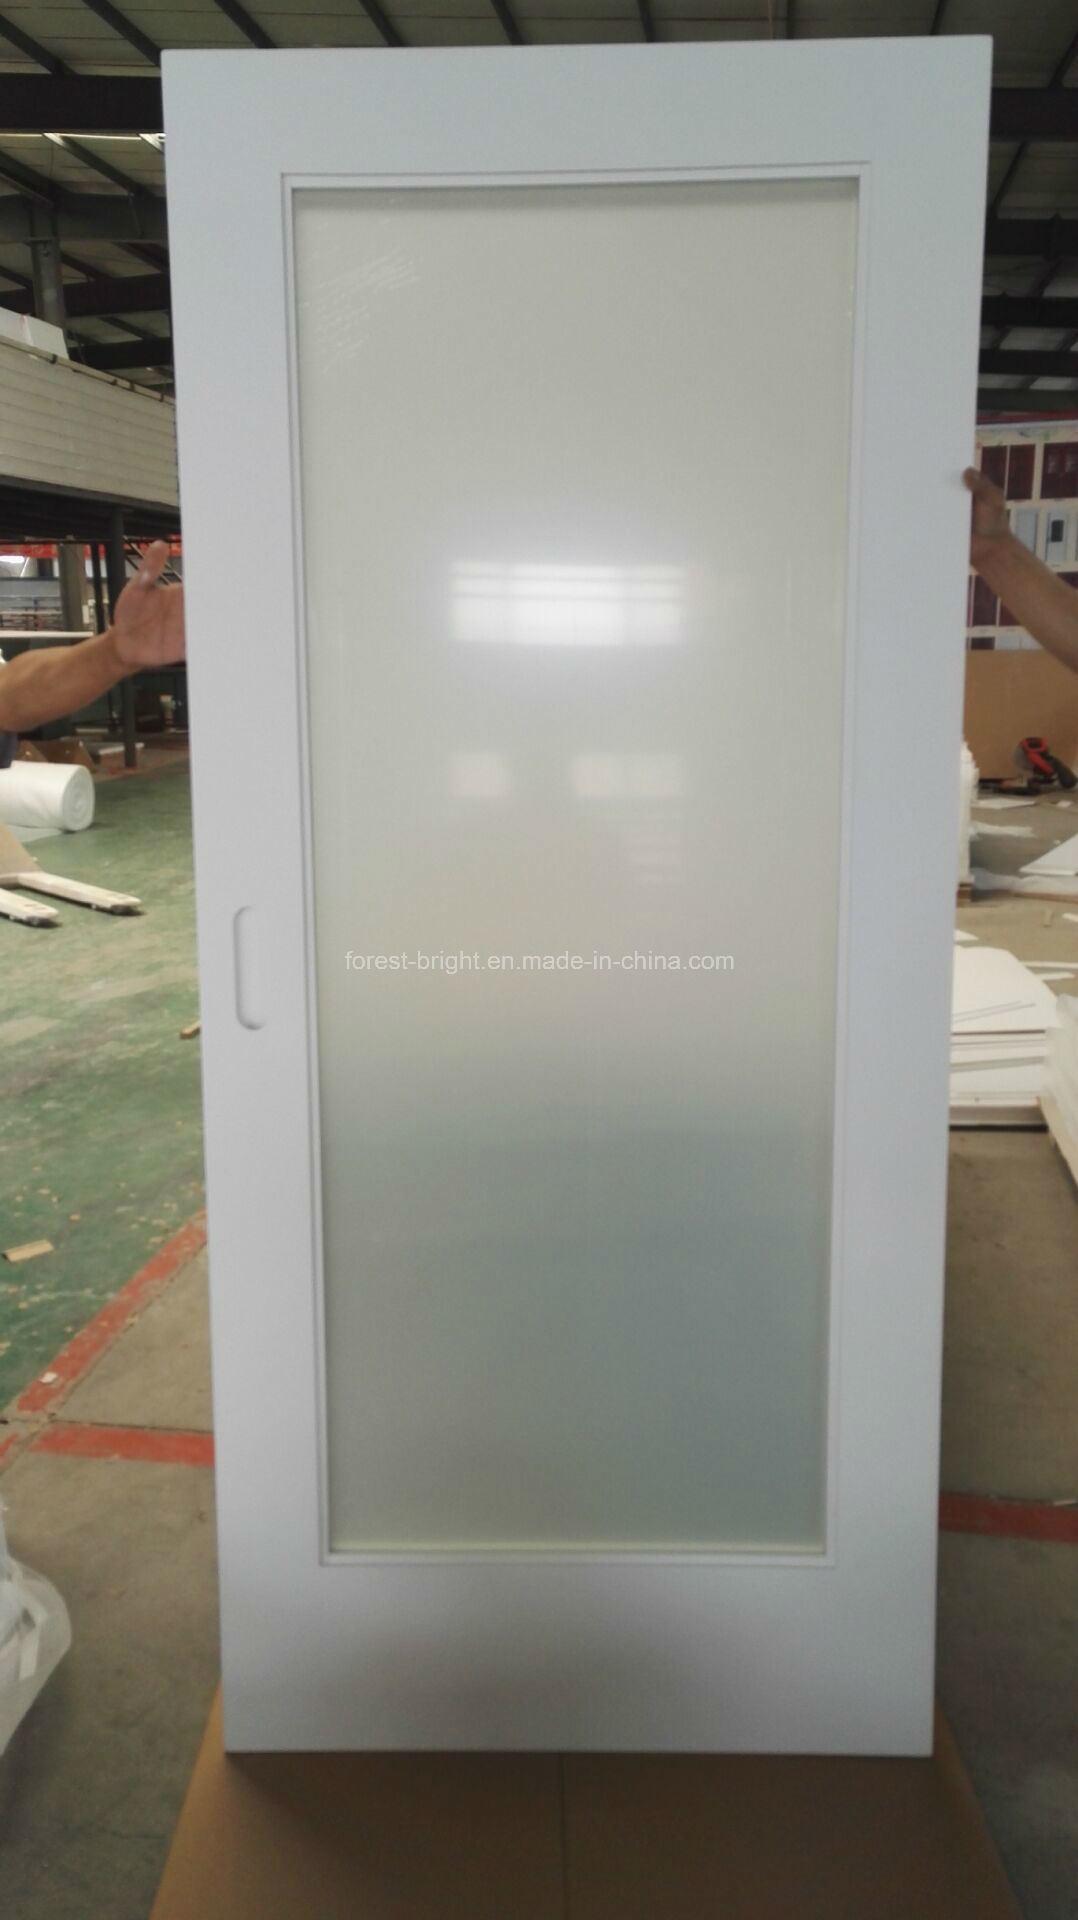 Marriott Hotel, White Painted Laminated Glass Sliding Barn Door Style for Bathroom Entry Door